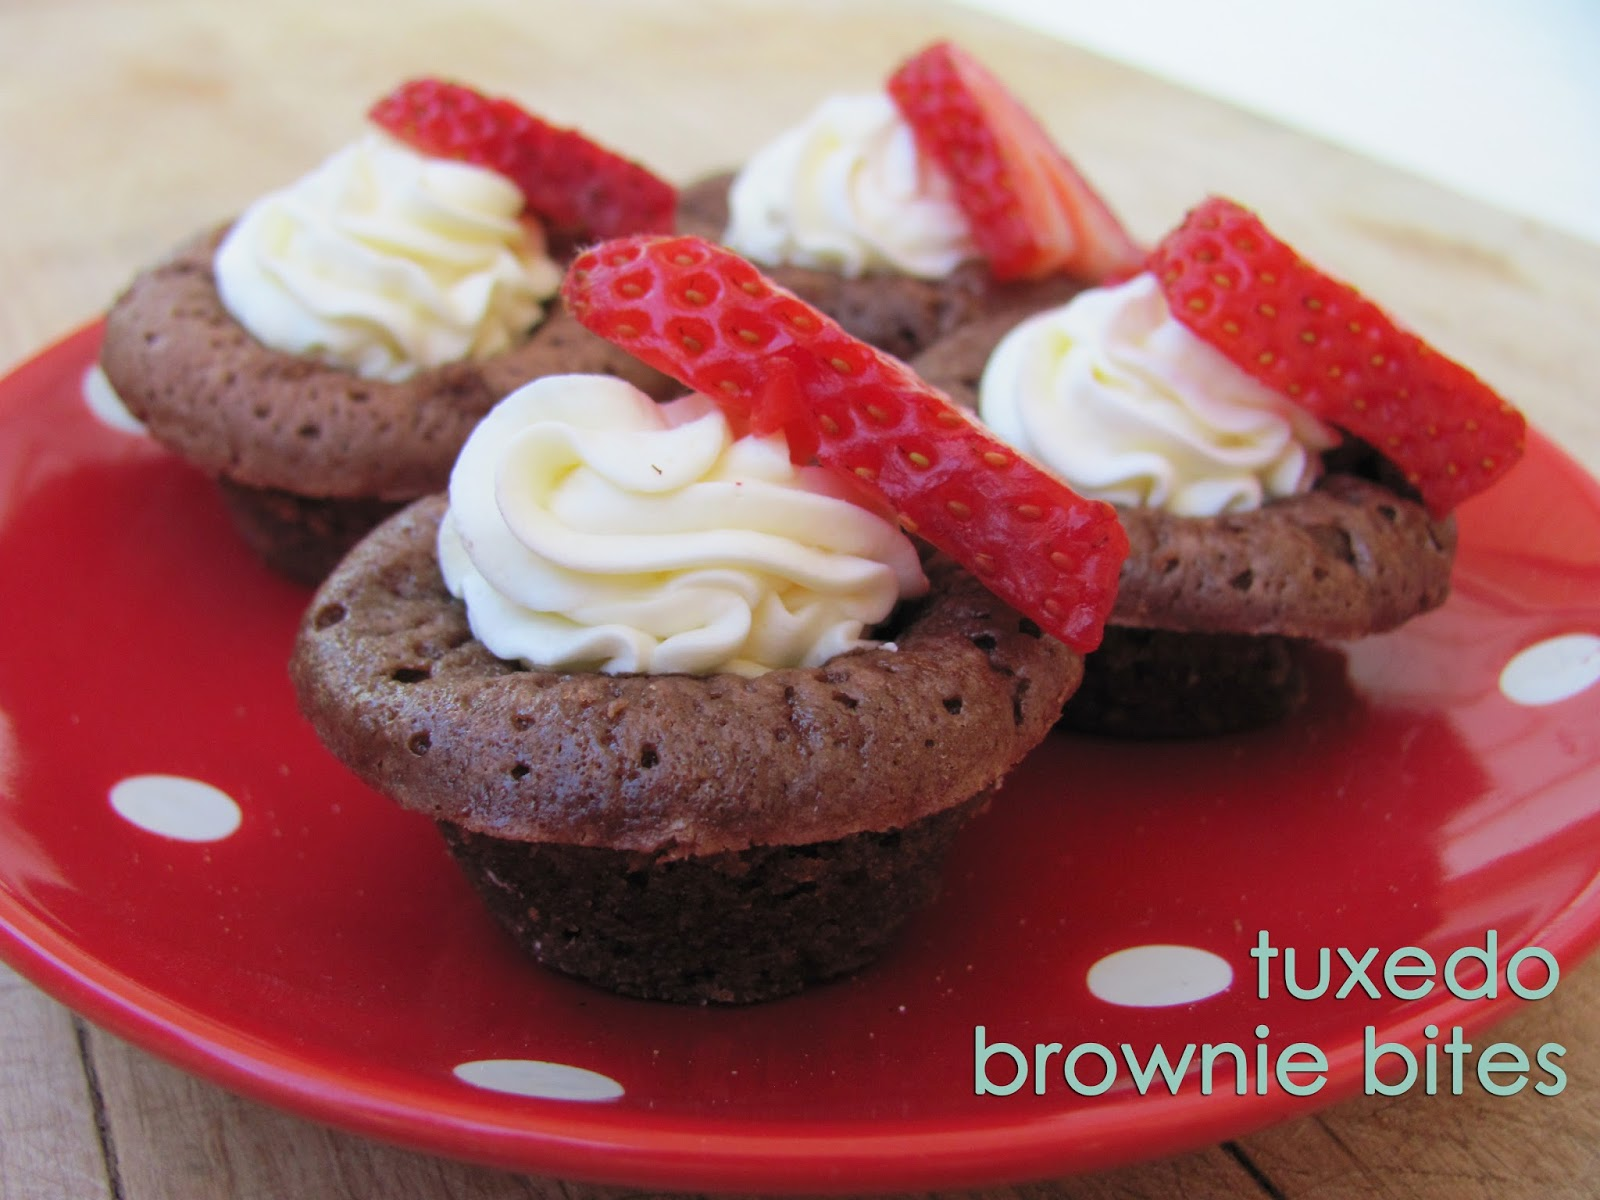 Tuxedo Brownie Bites